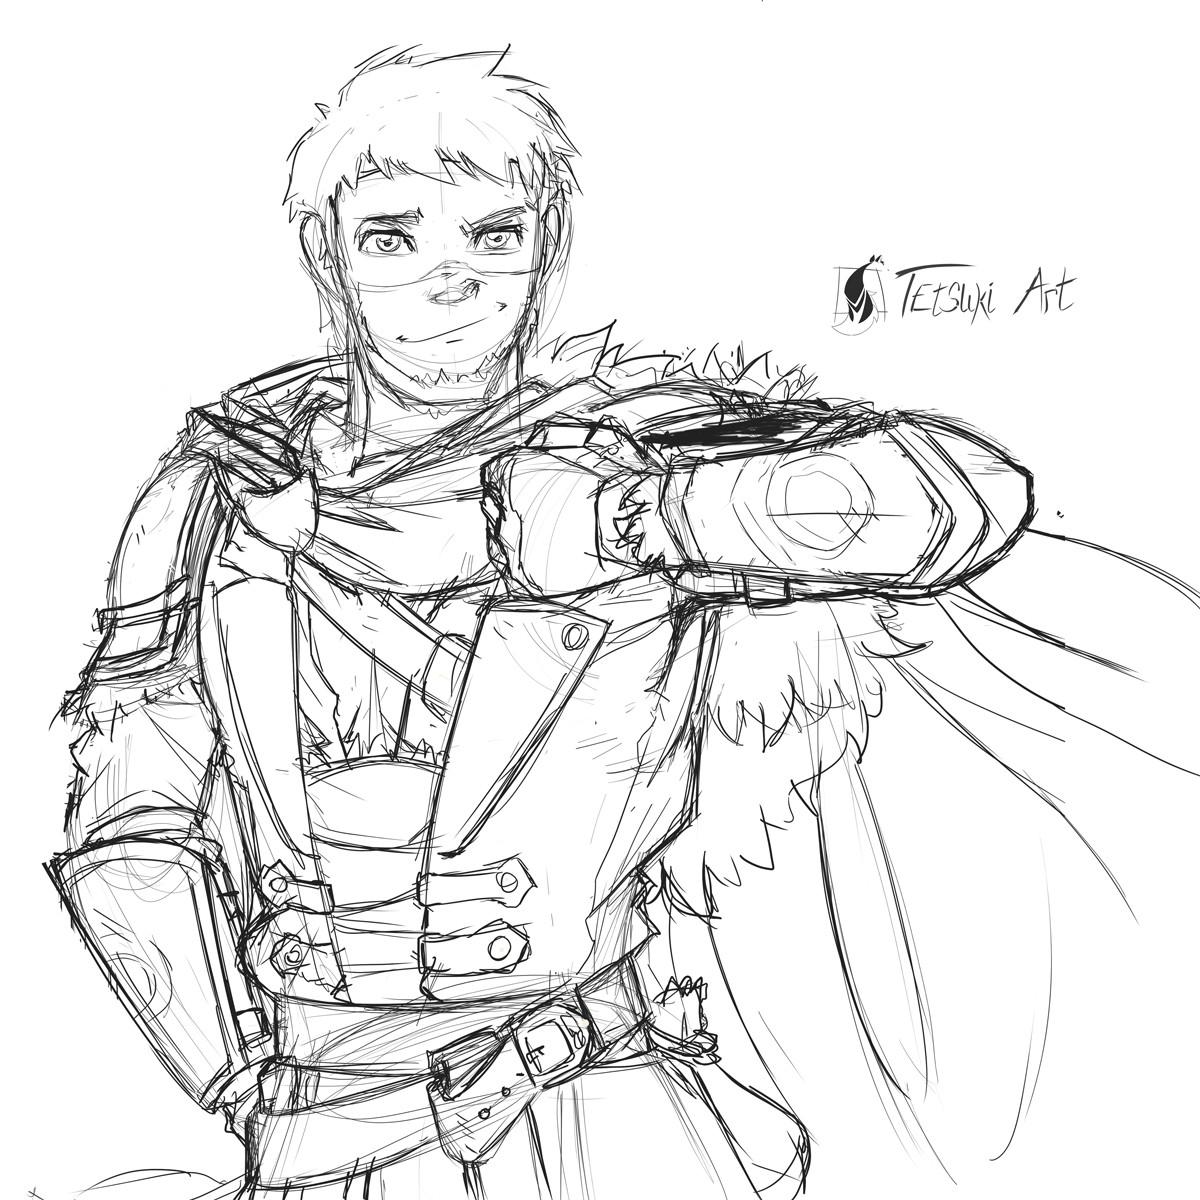 Sketch of the idea